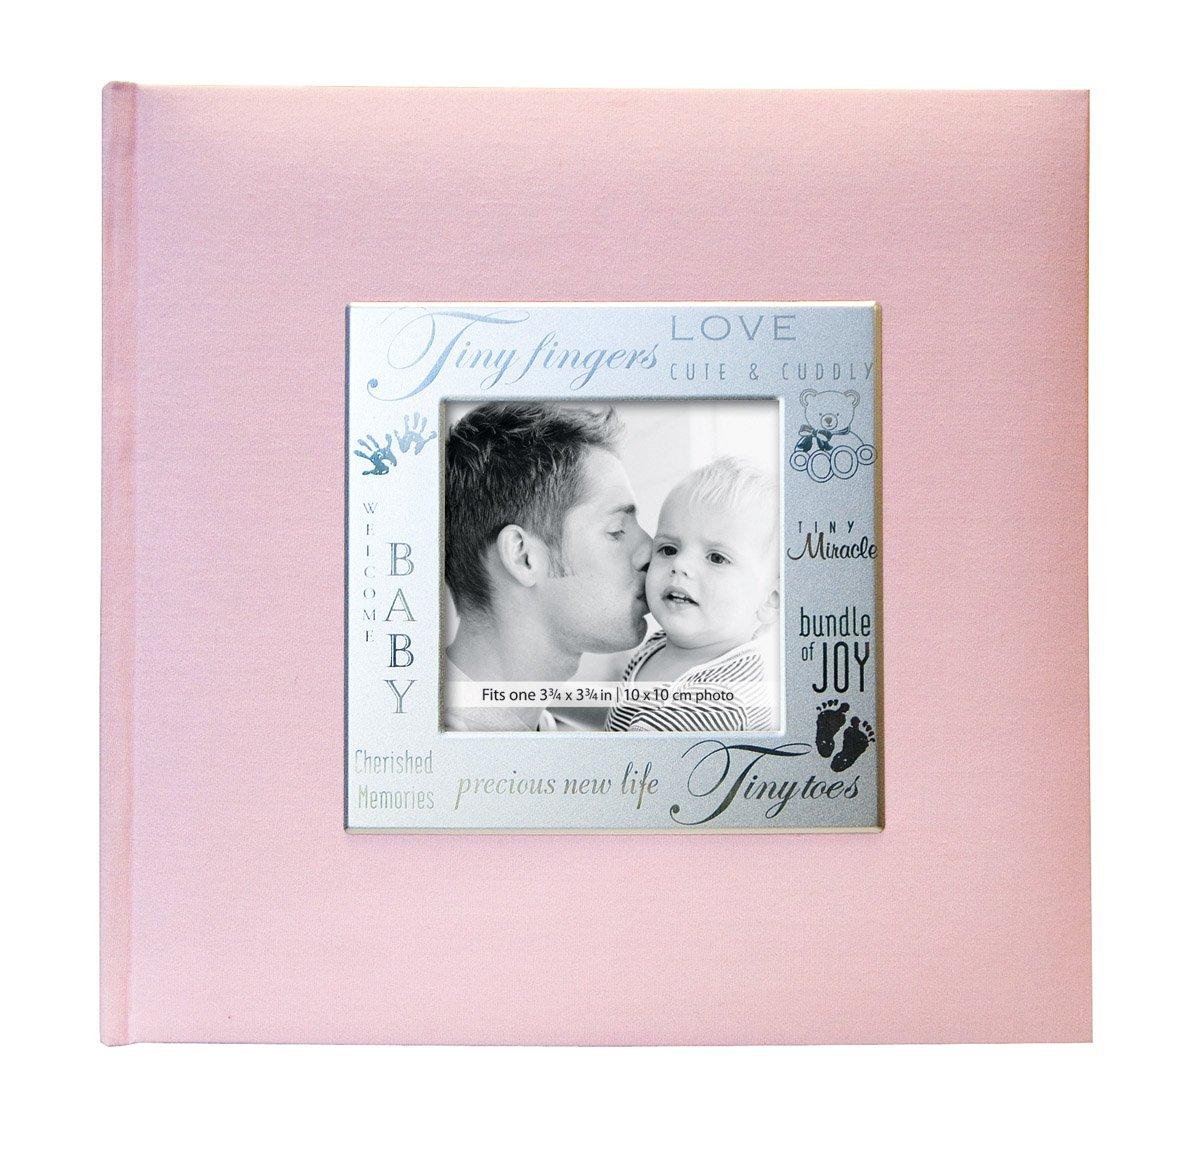 MBI 9x9 Inch Fabric Expressions Pocket Album, Pink (846611)